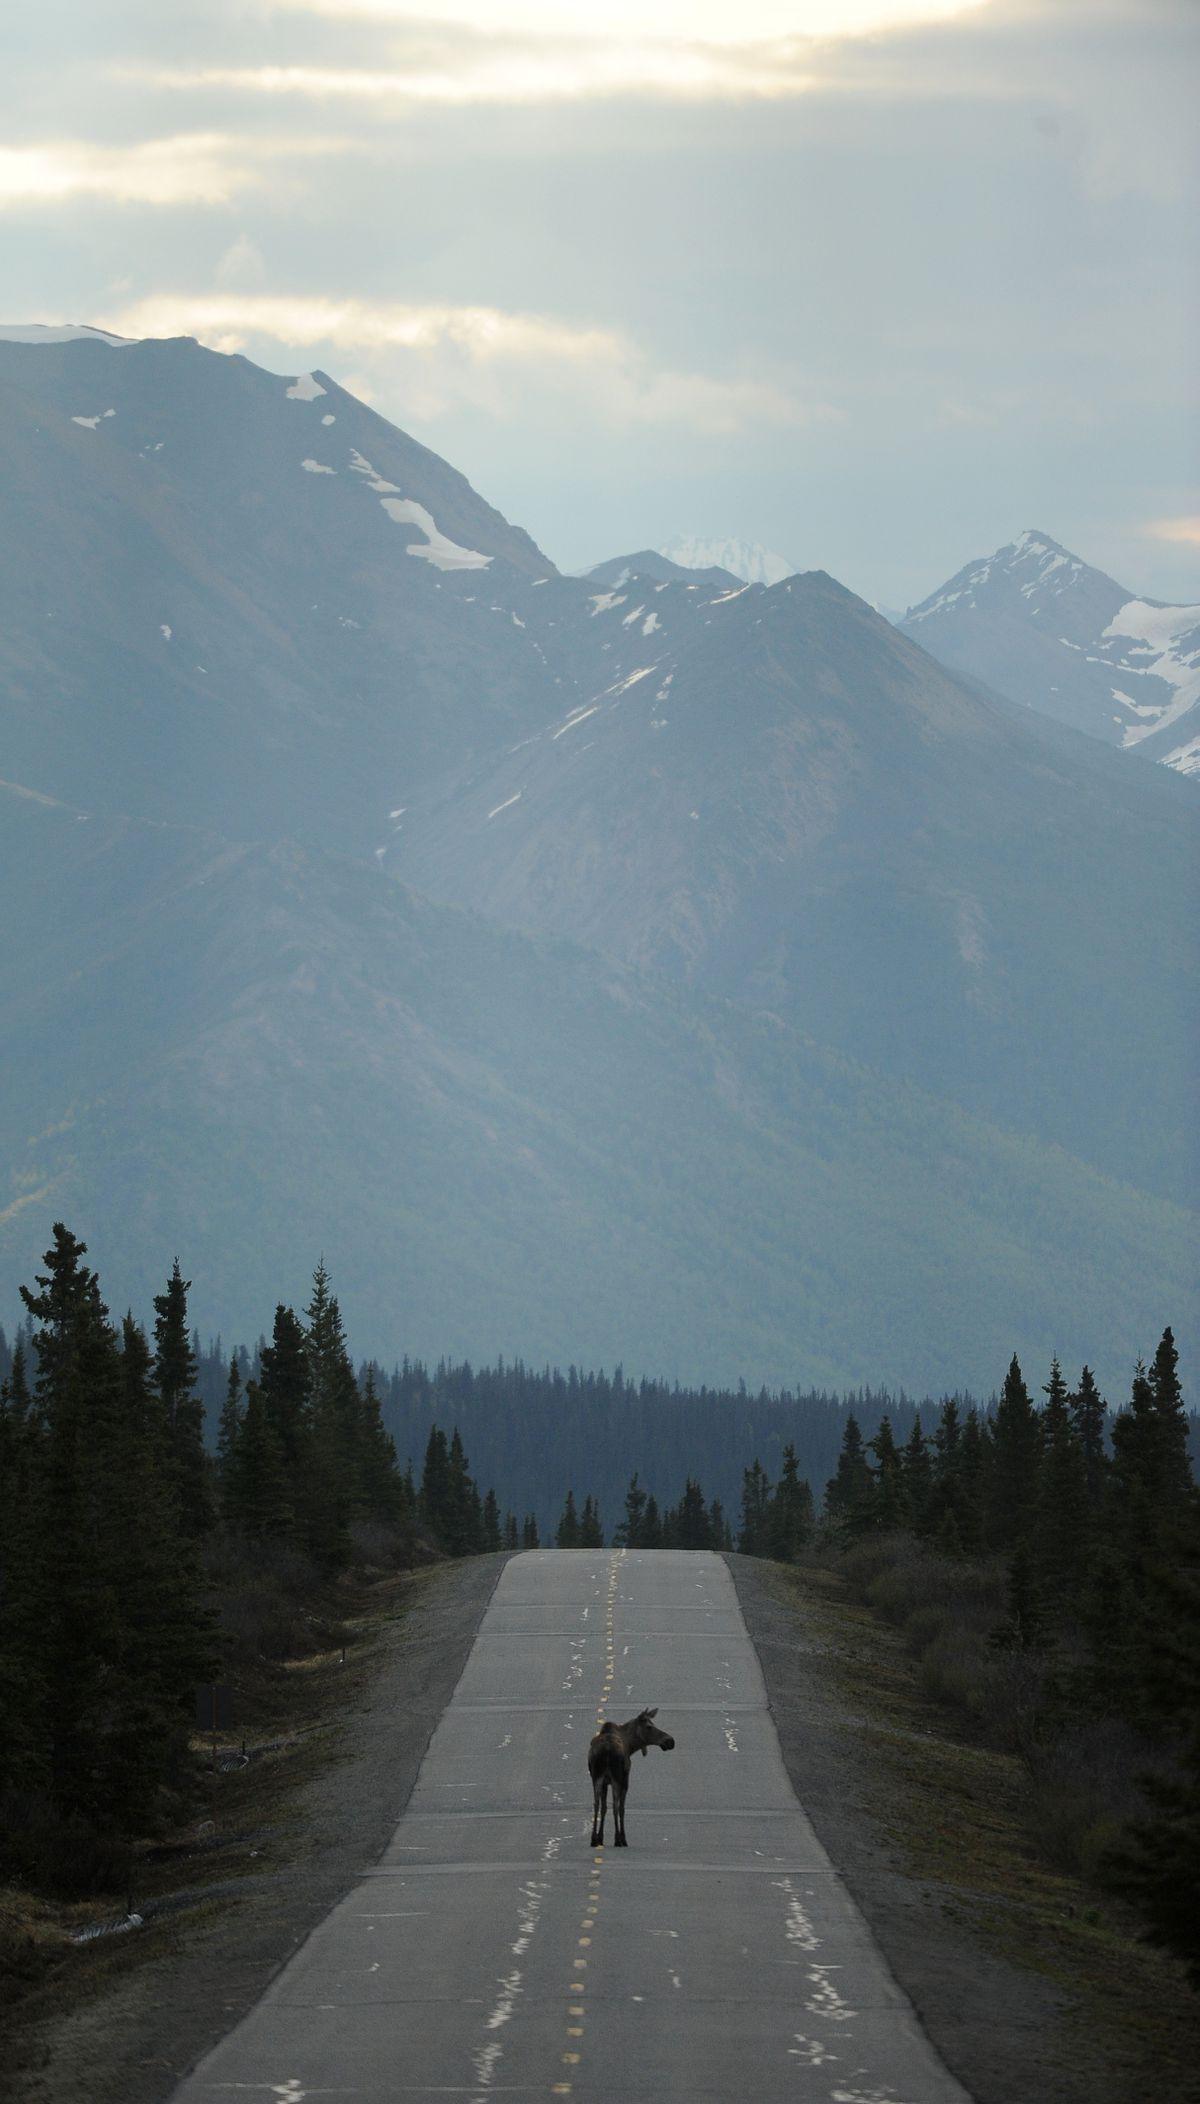 A moose walks down the park road in Denali National Park and Preserve on Thursday, May 19, 2016. (Bob Hallinen / Alaska Dispatch News)